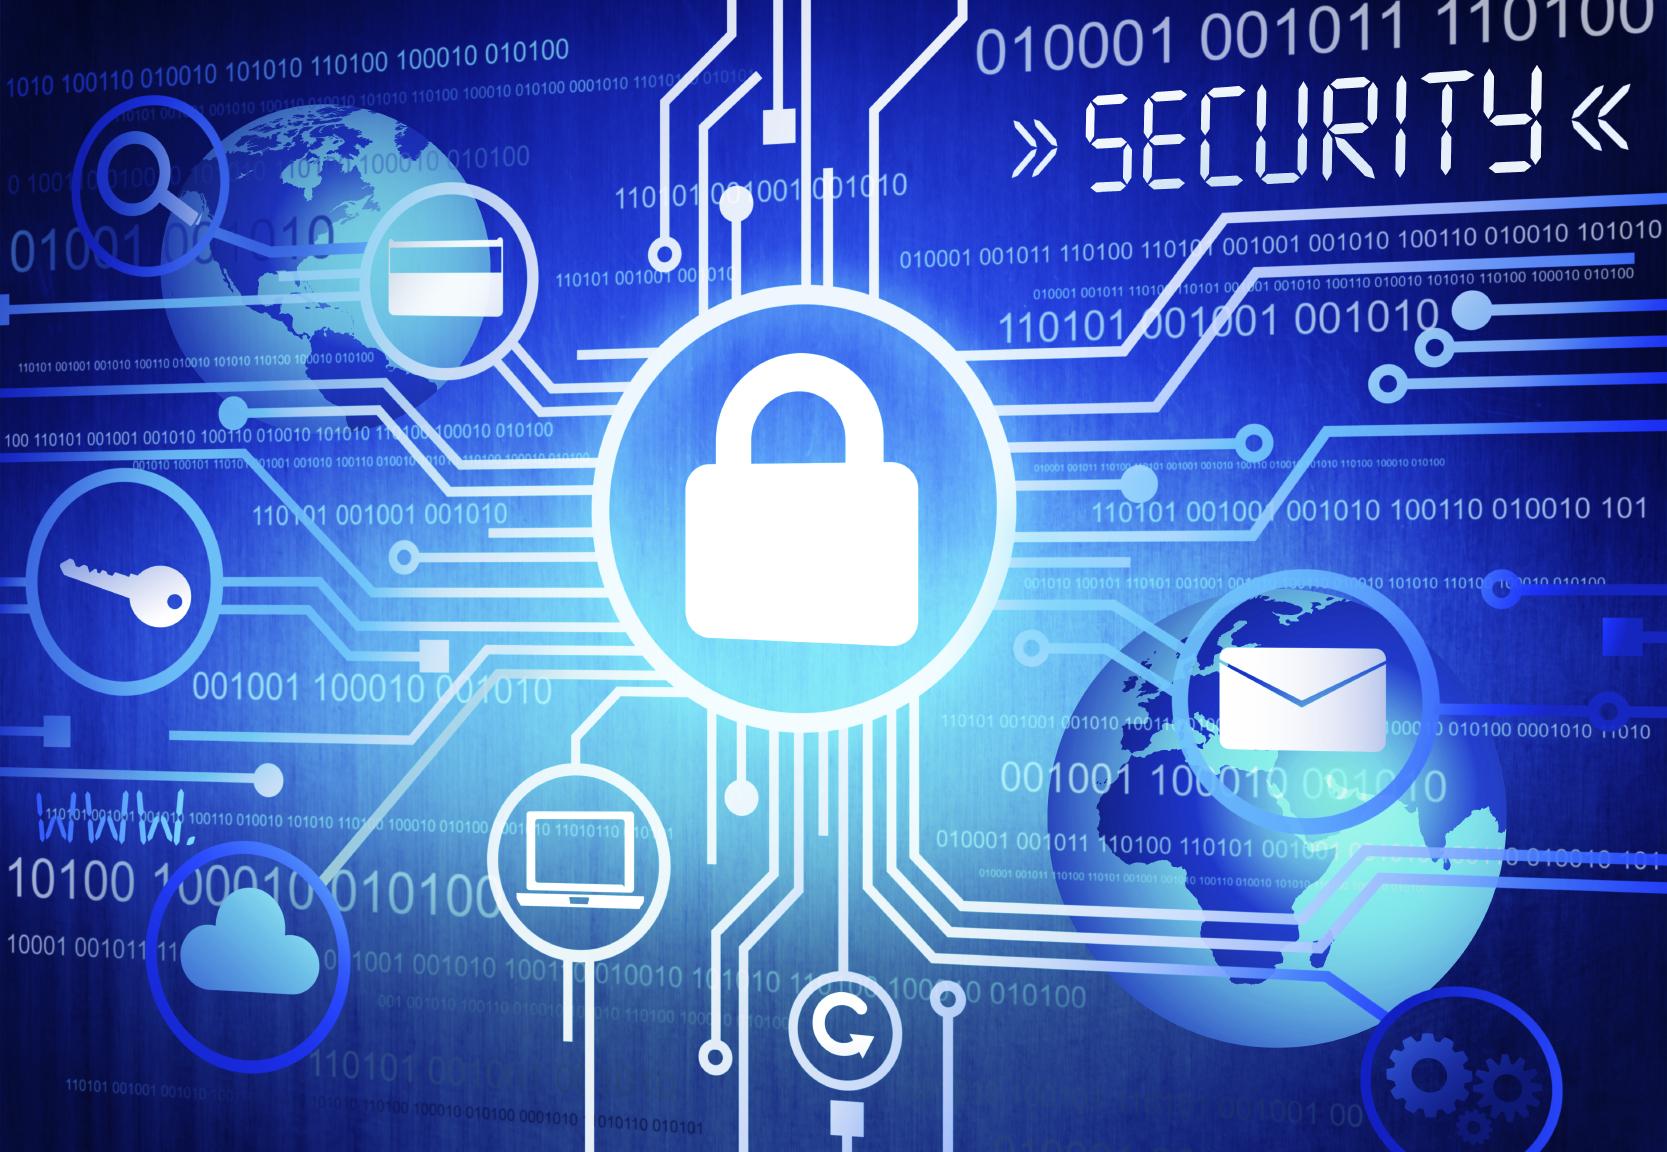 Internet Security System